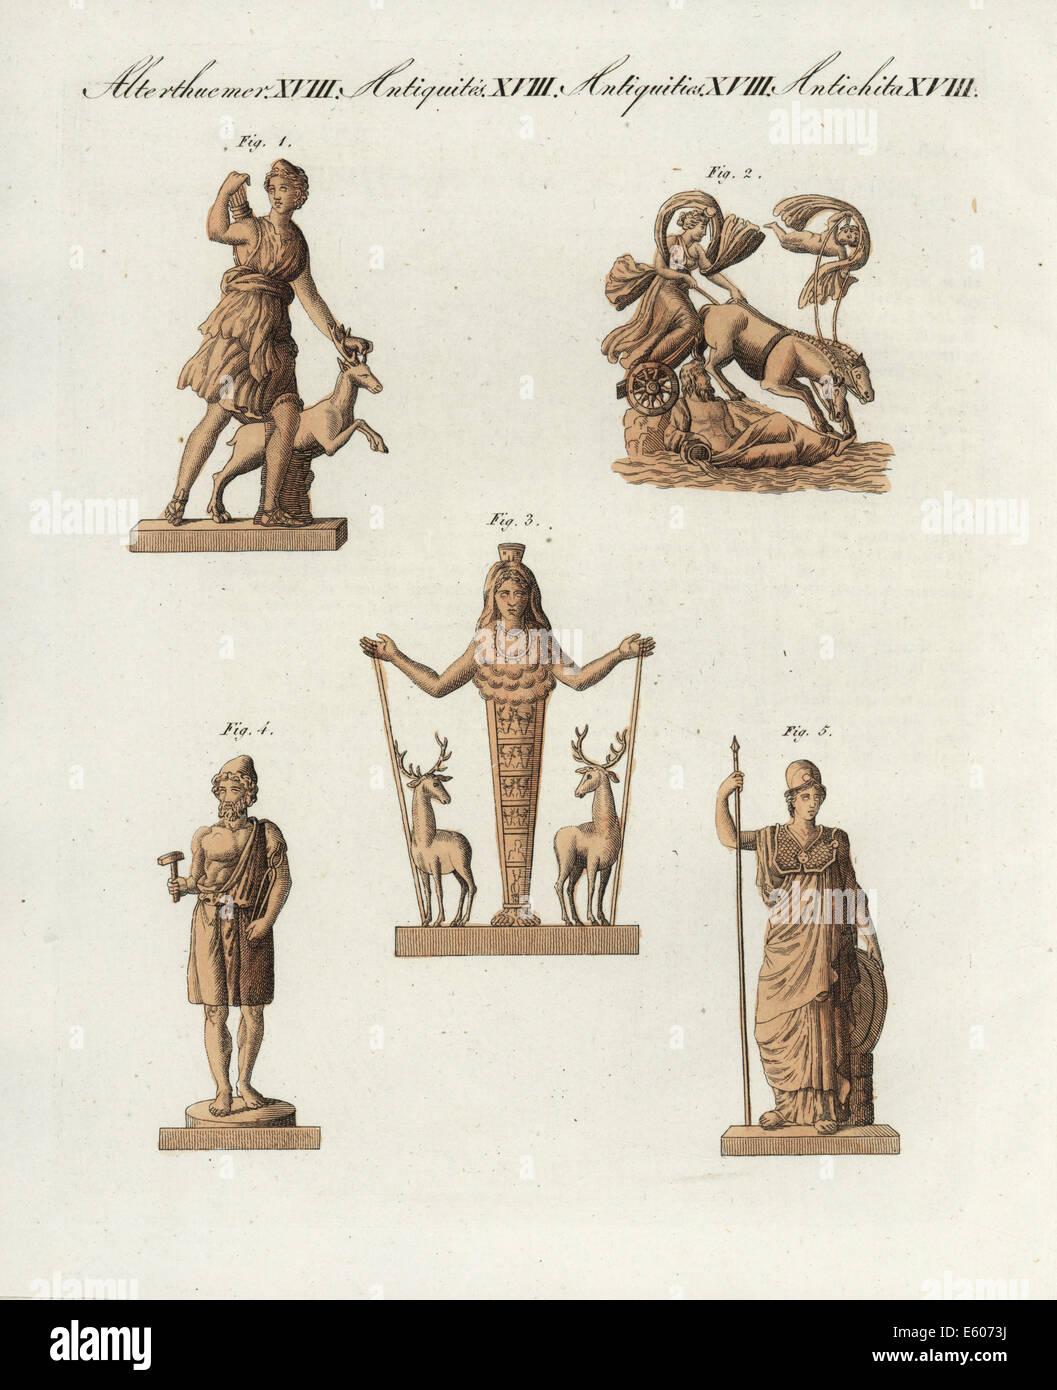 Greek and Roman gods: Diane, Vulcan and Minerva. - Stock Image